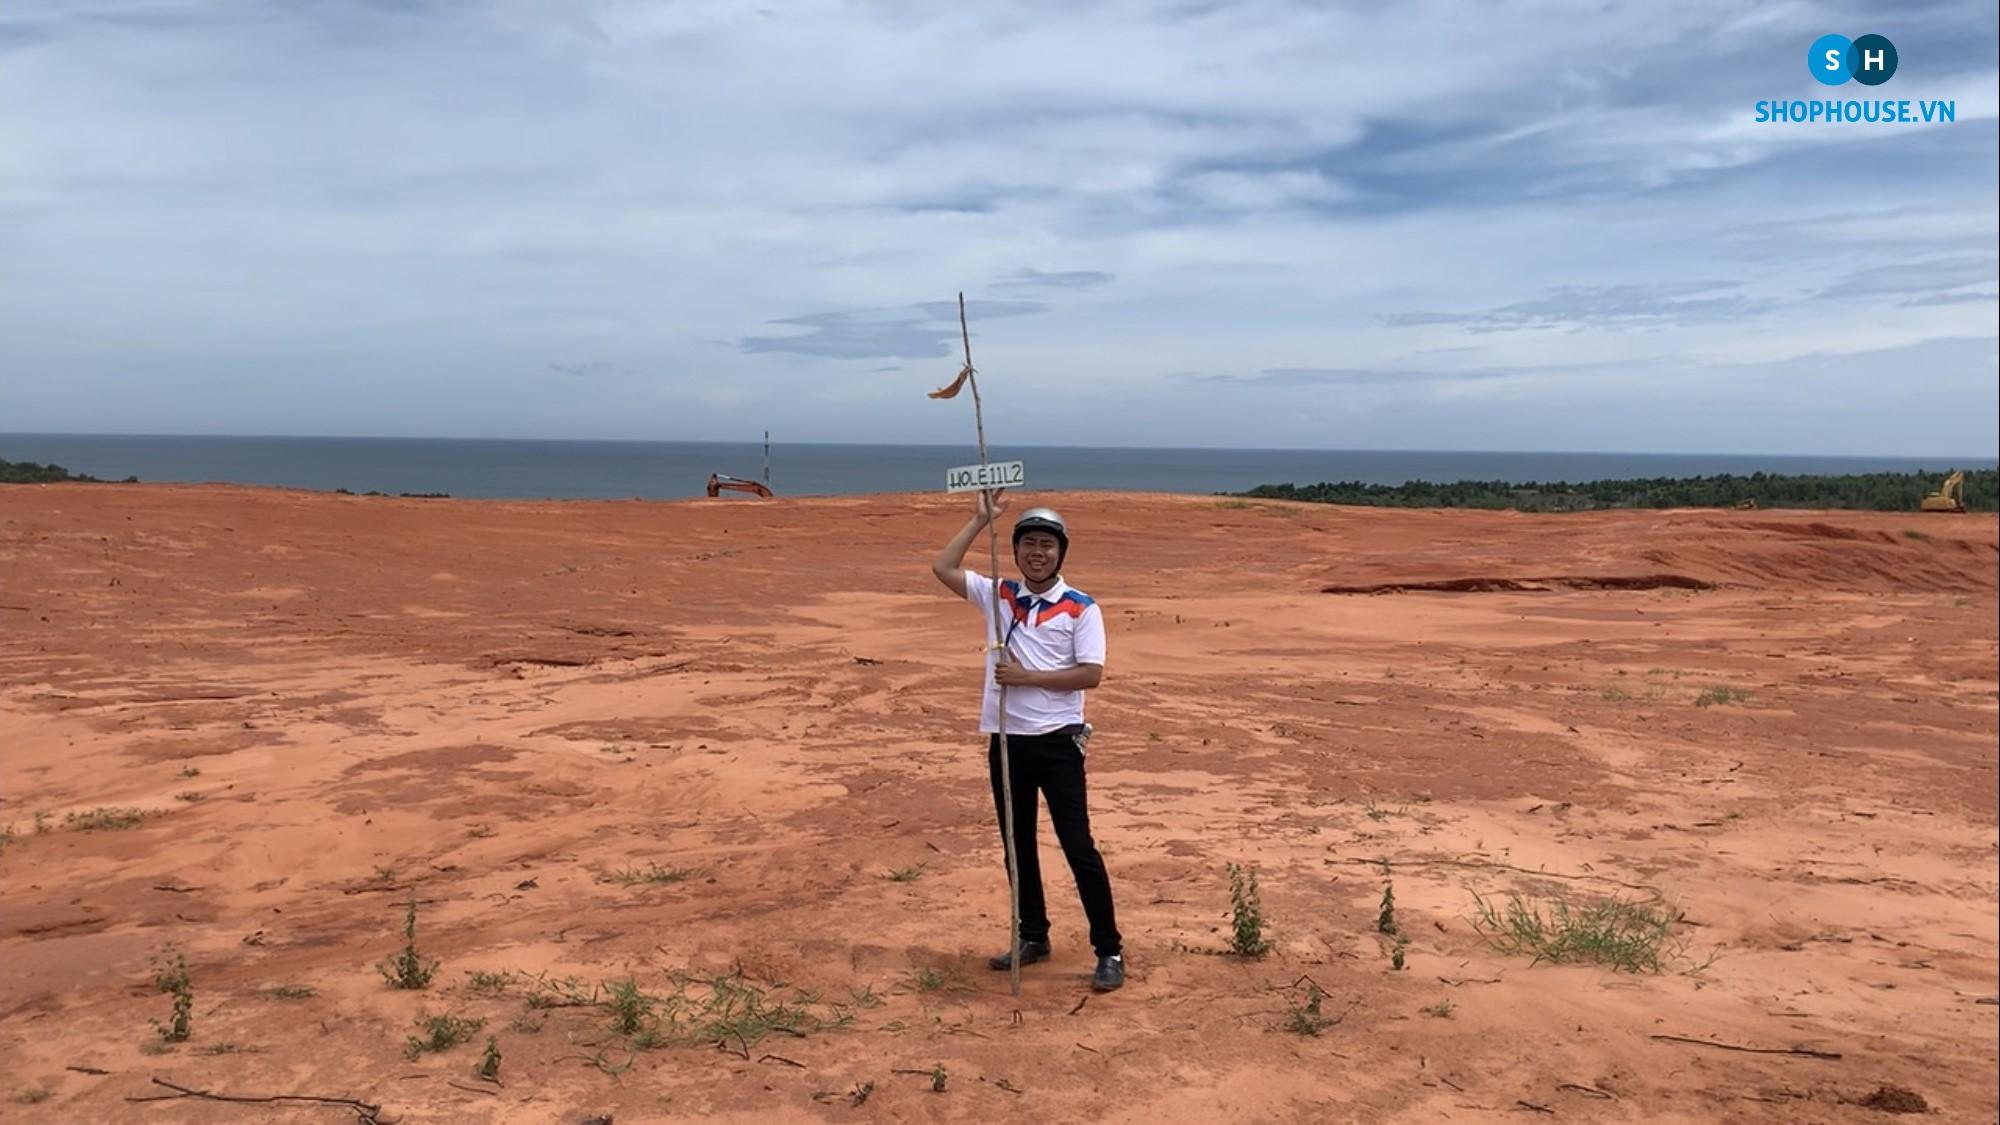 hole-ho-golf-novaworld-phan-thiet-san-ocean